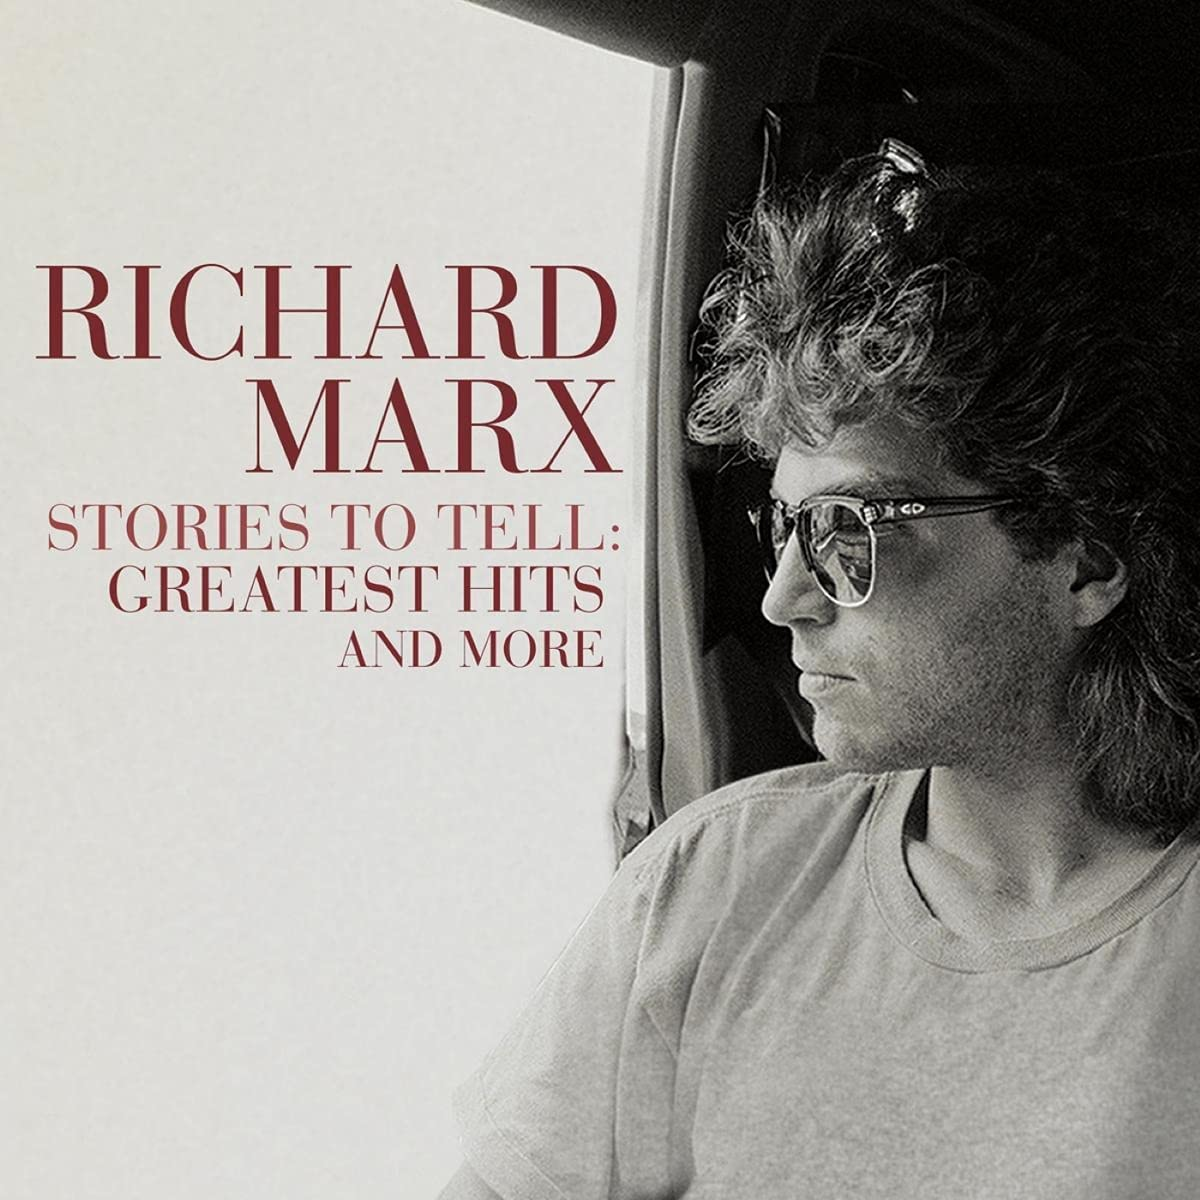 richardmarx_stories 021